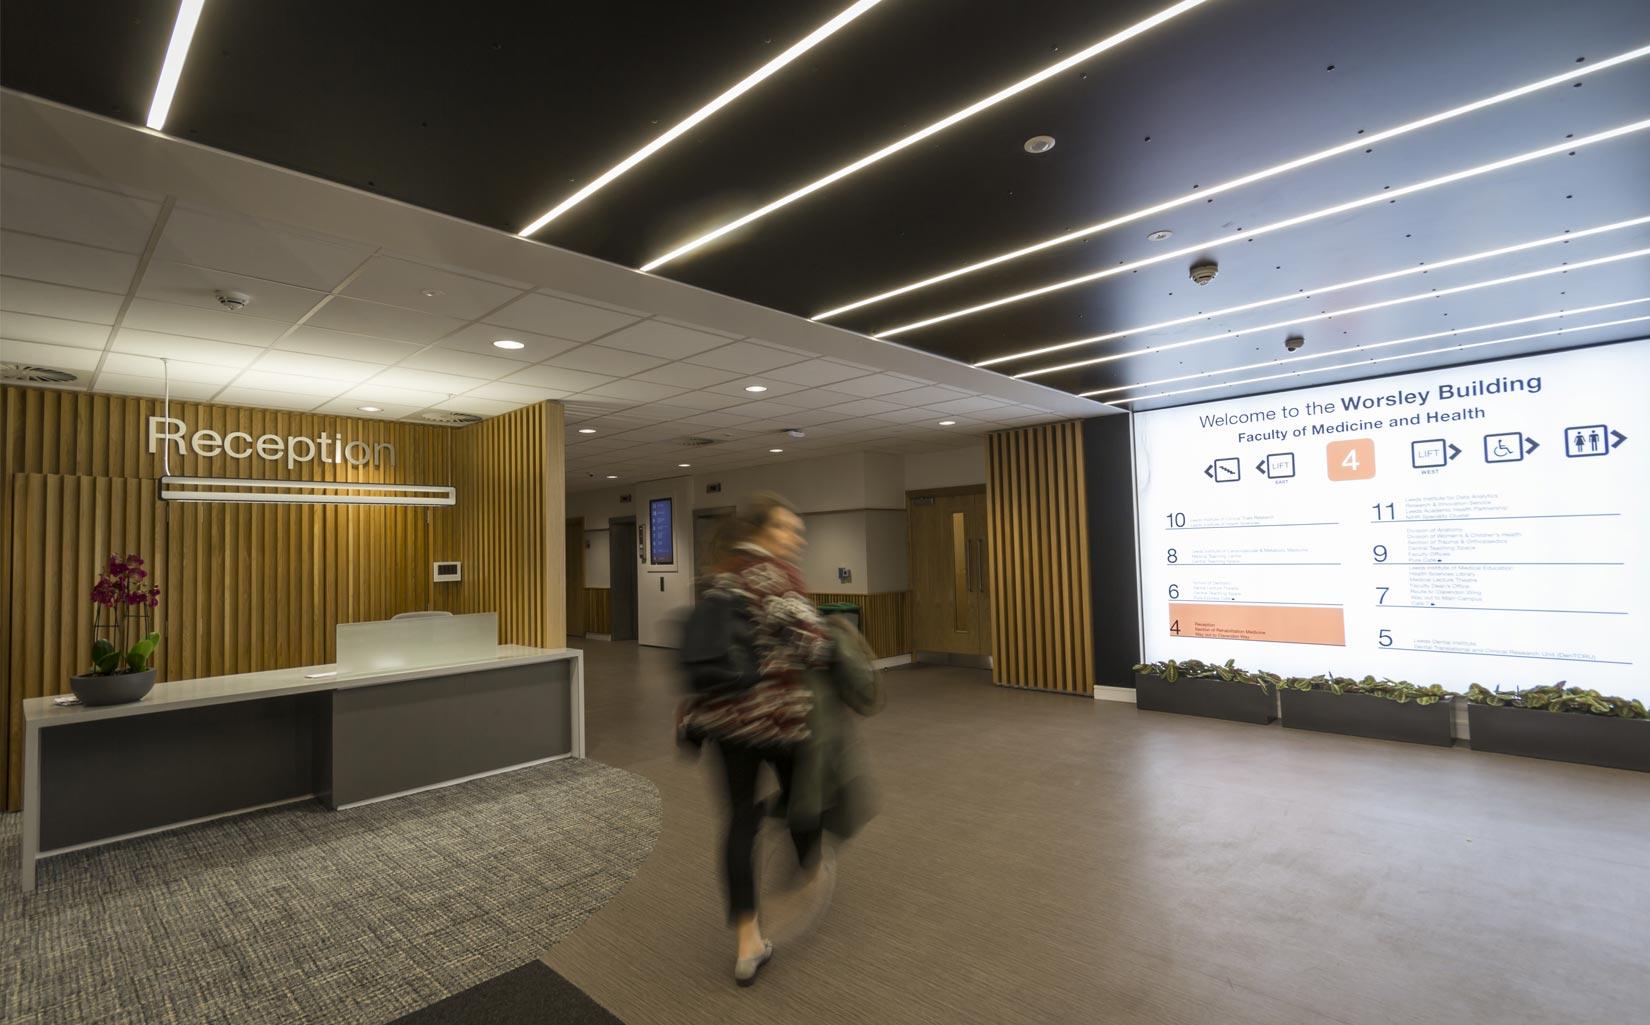 Worsley Building, University of Leeds, Reception Space